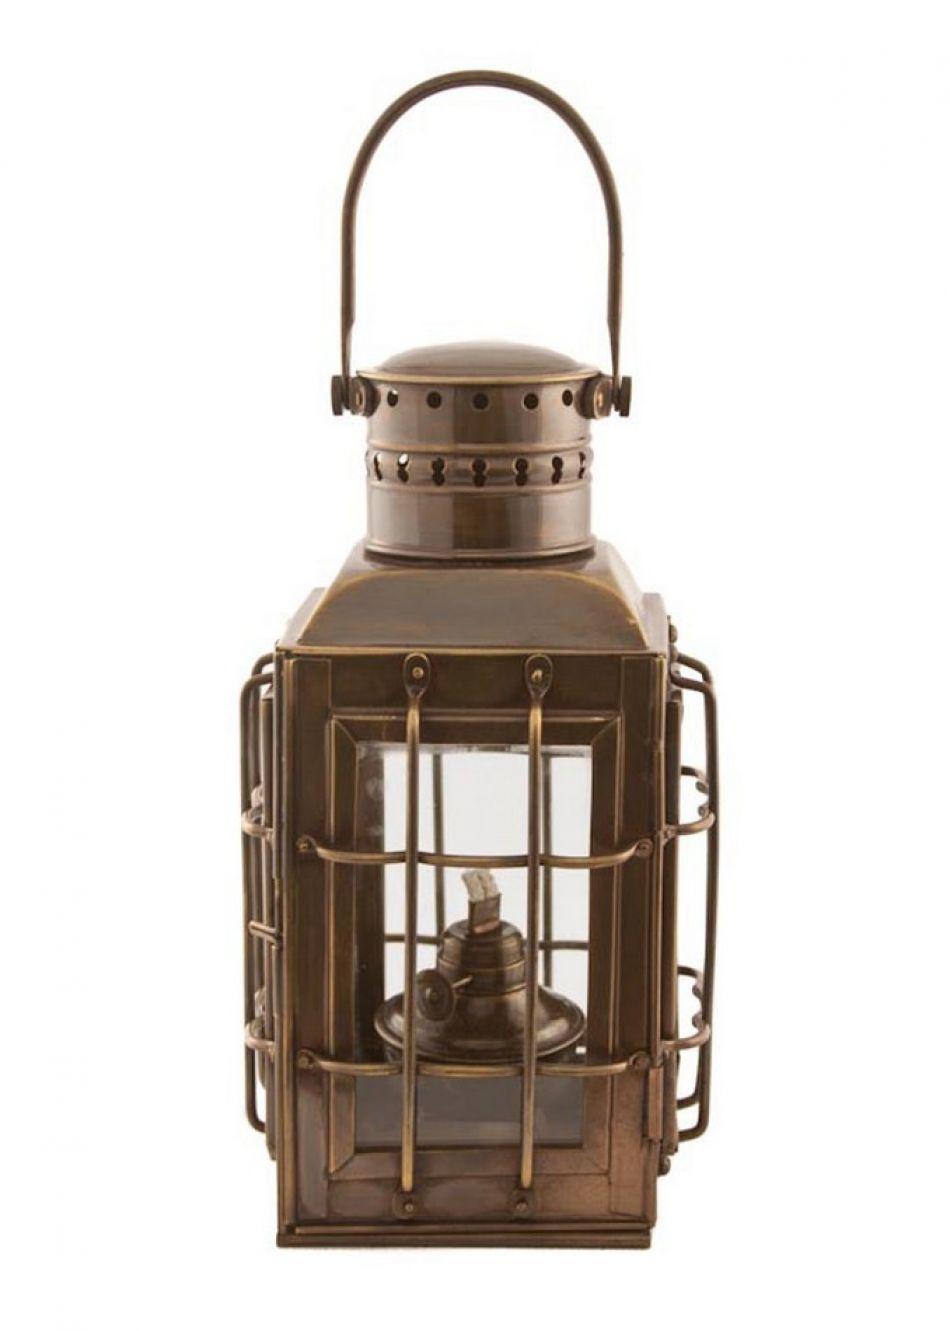 Buy Antique Brass Chiefs Oil Lamp 10in Nautical Decor